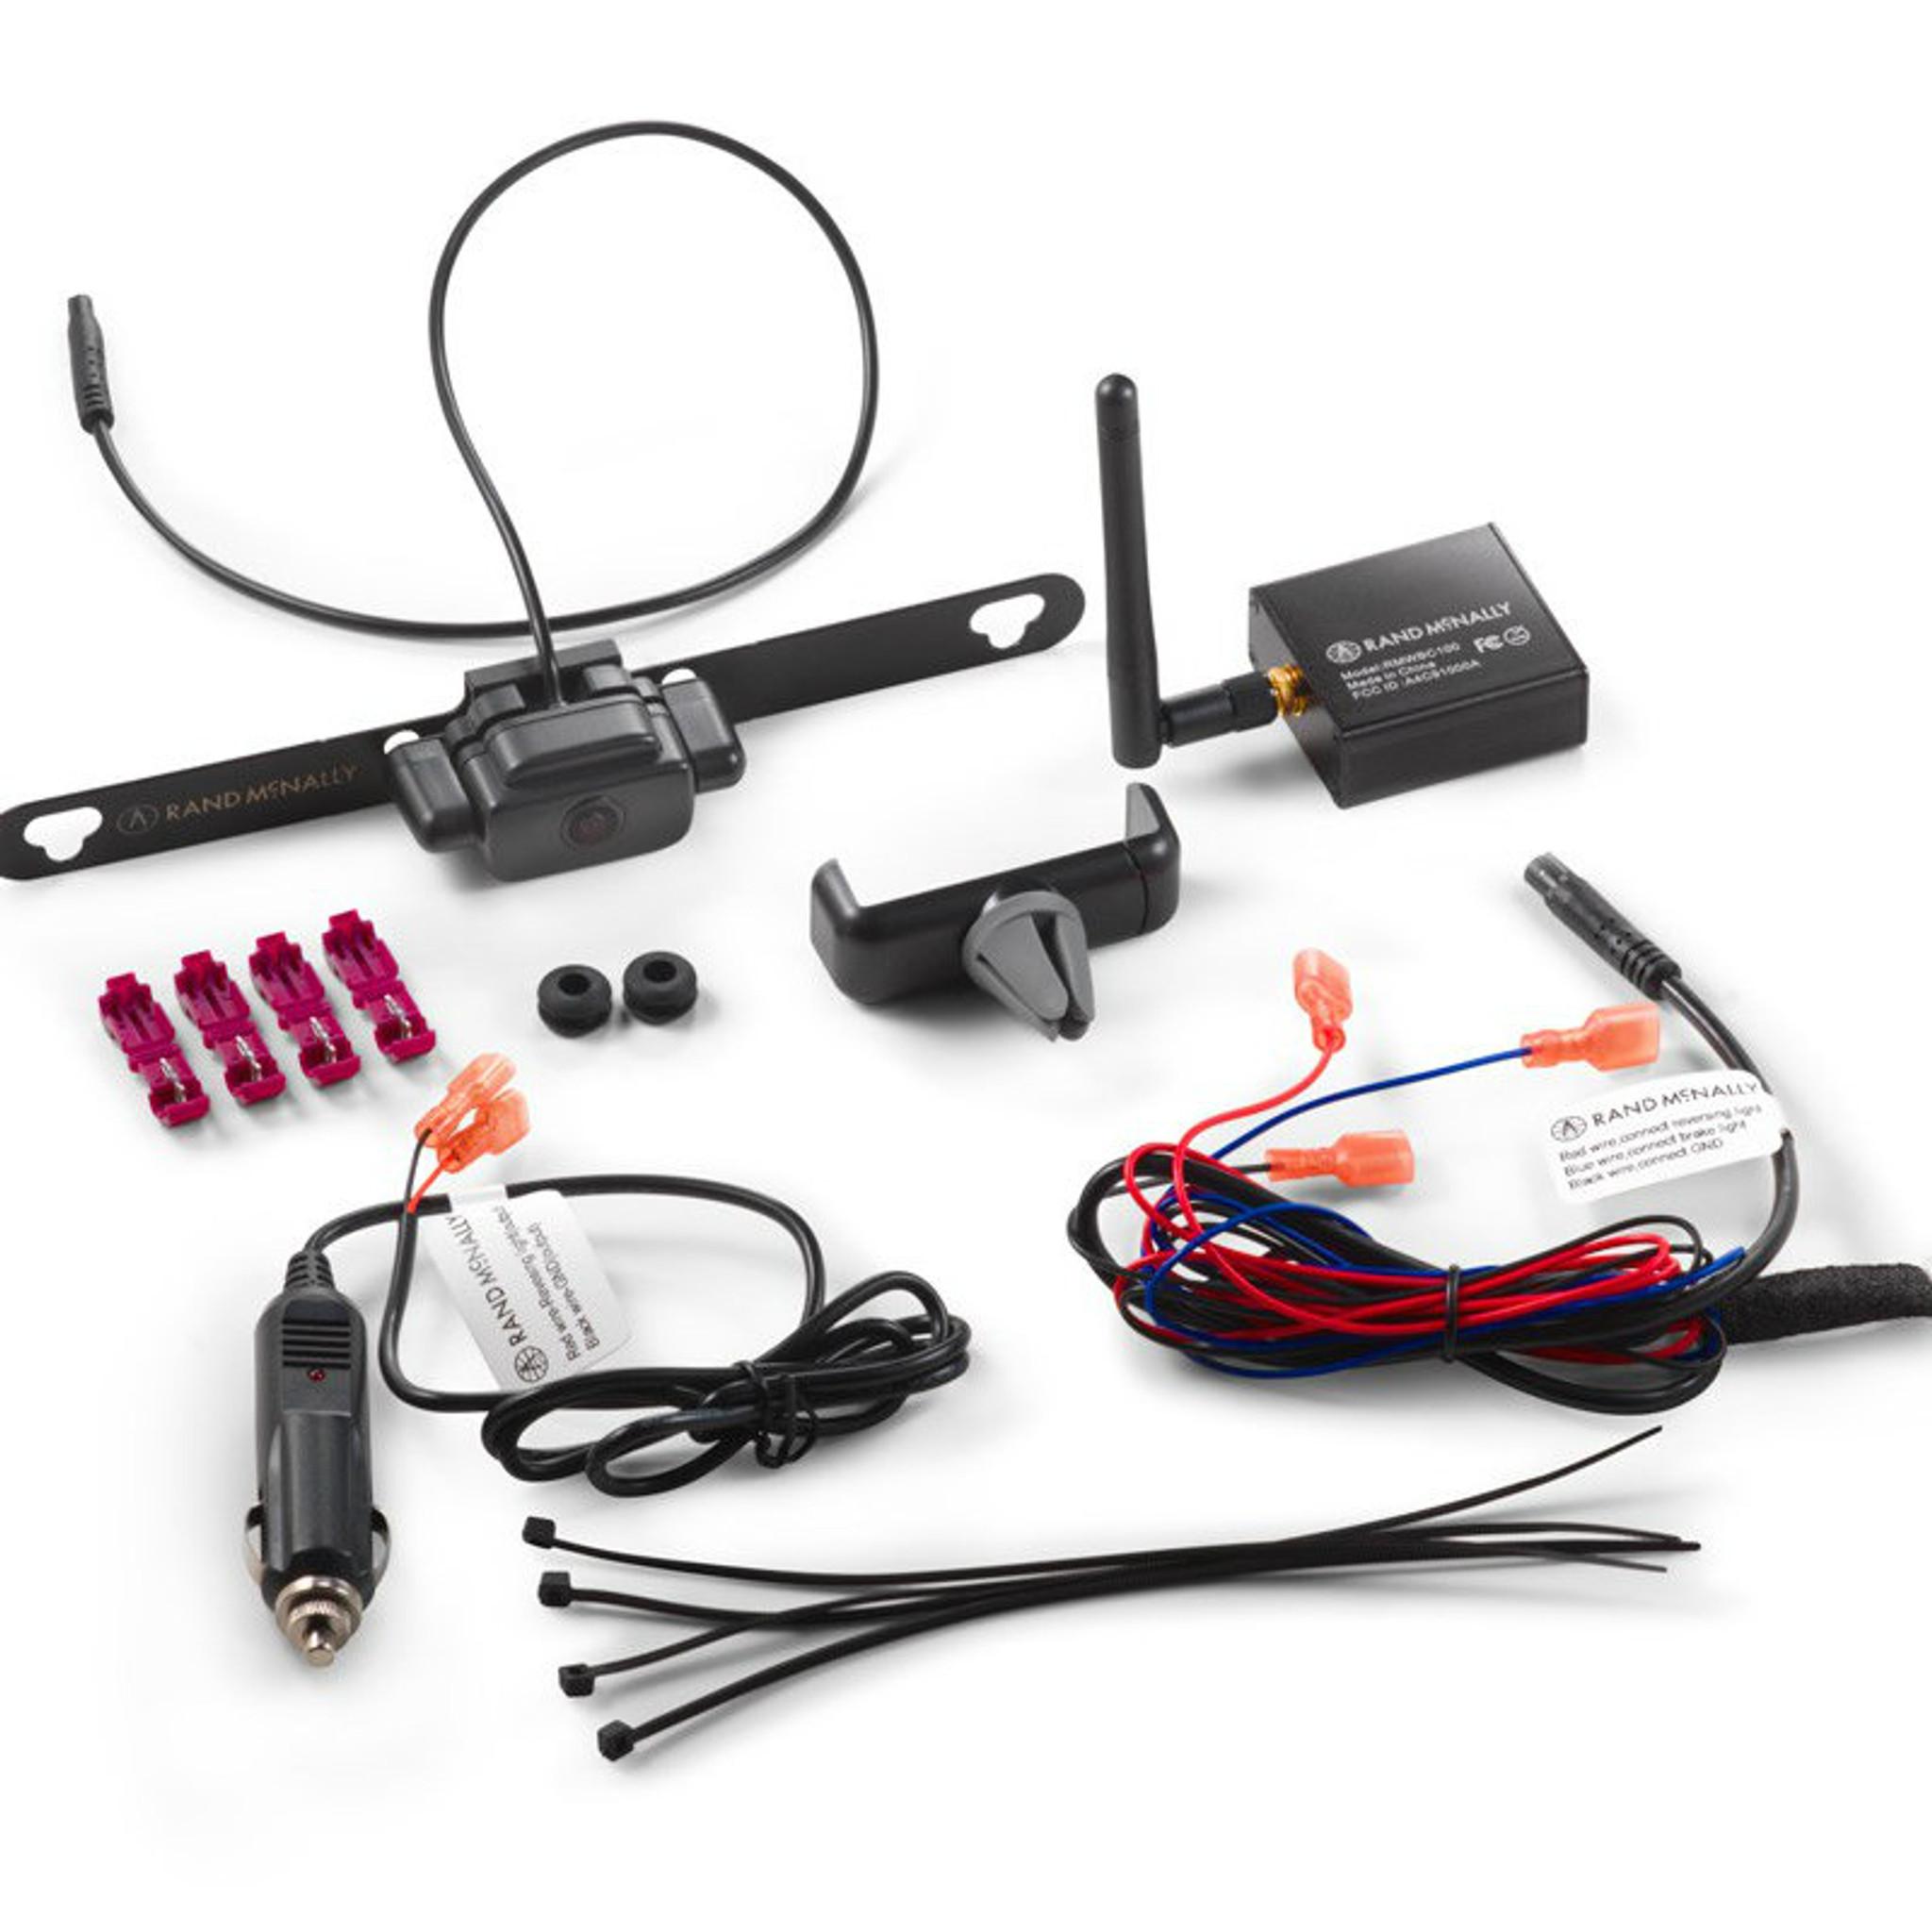 Rand McNally Wireless Backup Camera